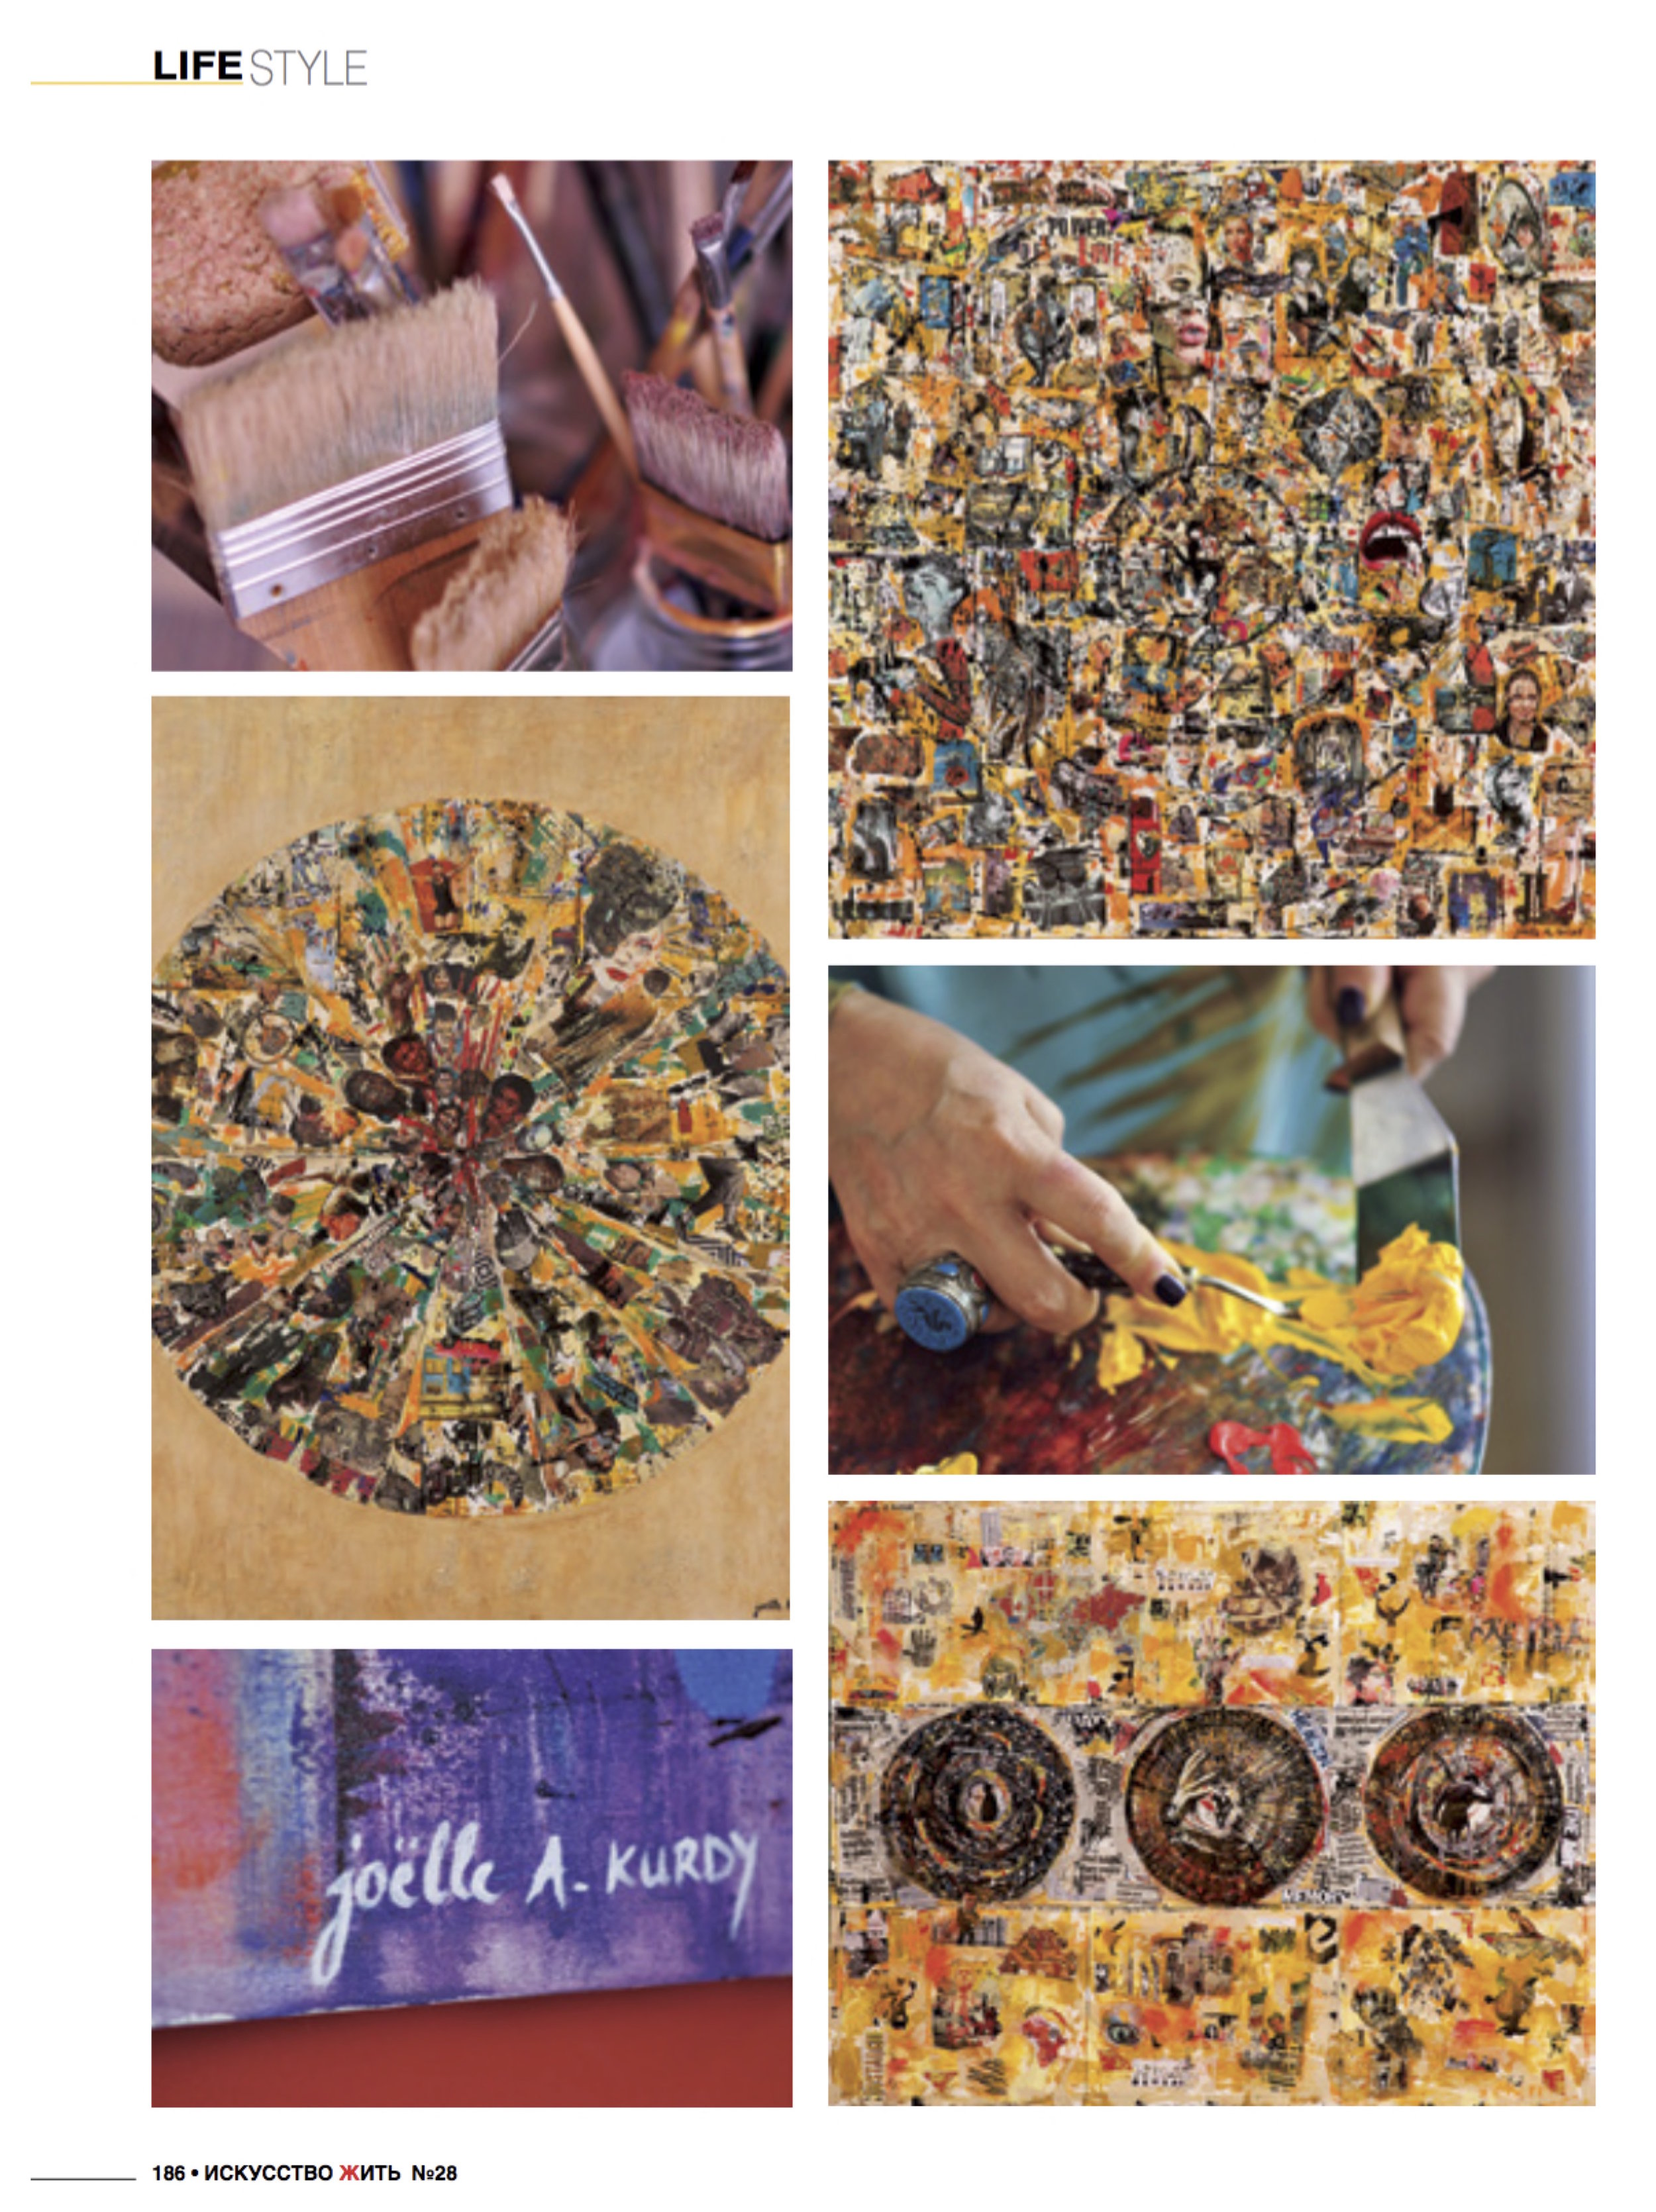 Joelle A Kurdy - May 2016 - The Art Of Living copy4.jpg